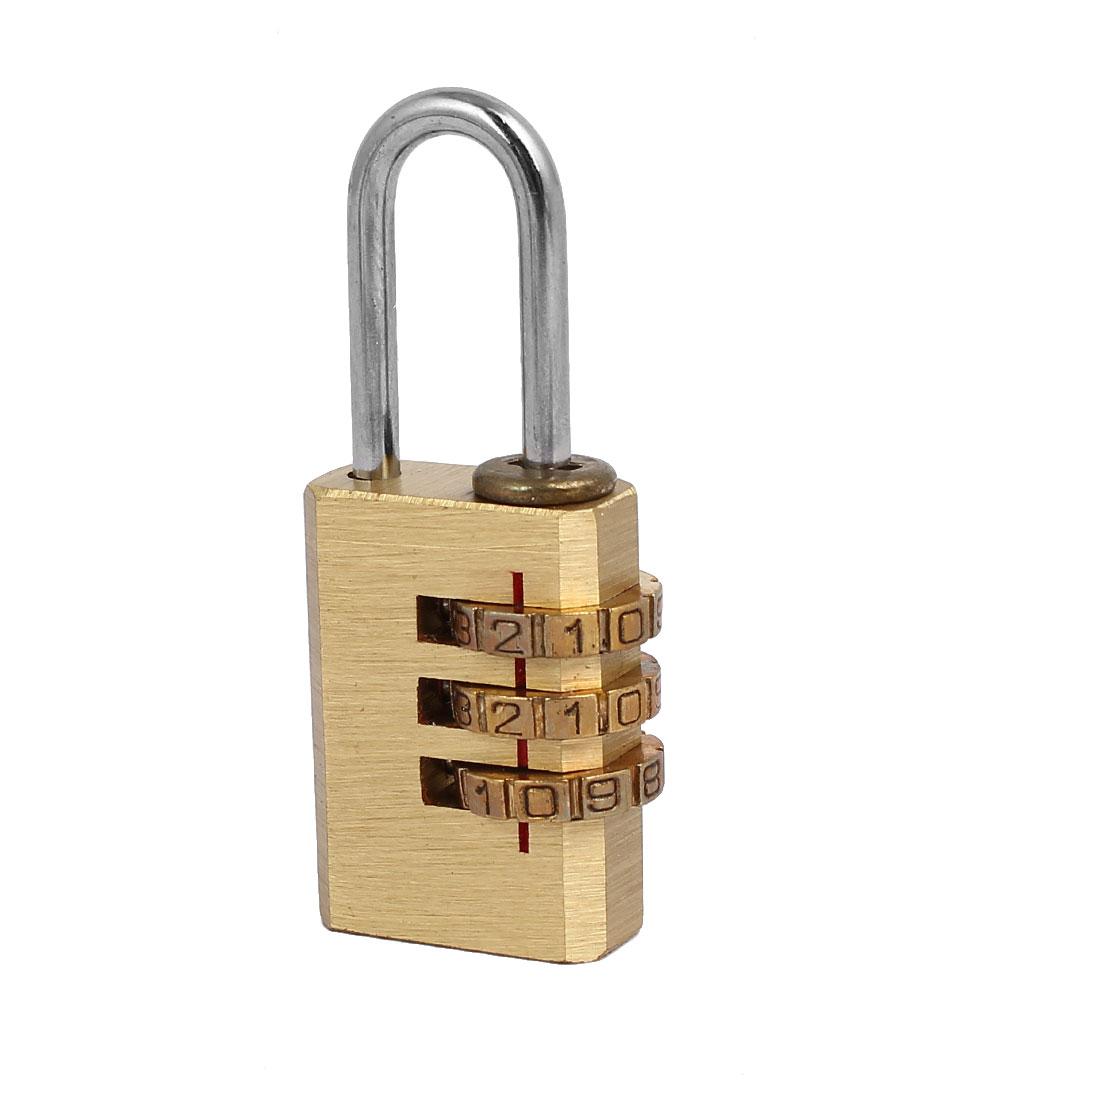 Suitcase Luggage Metal 3 Digit 0-9 Number Password Combination Lock Padlock